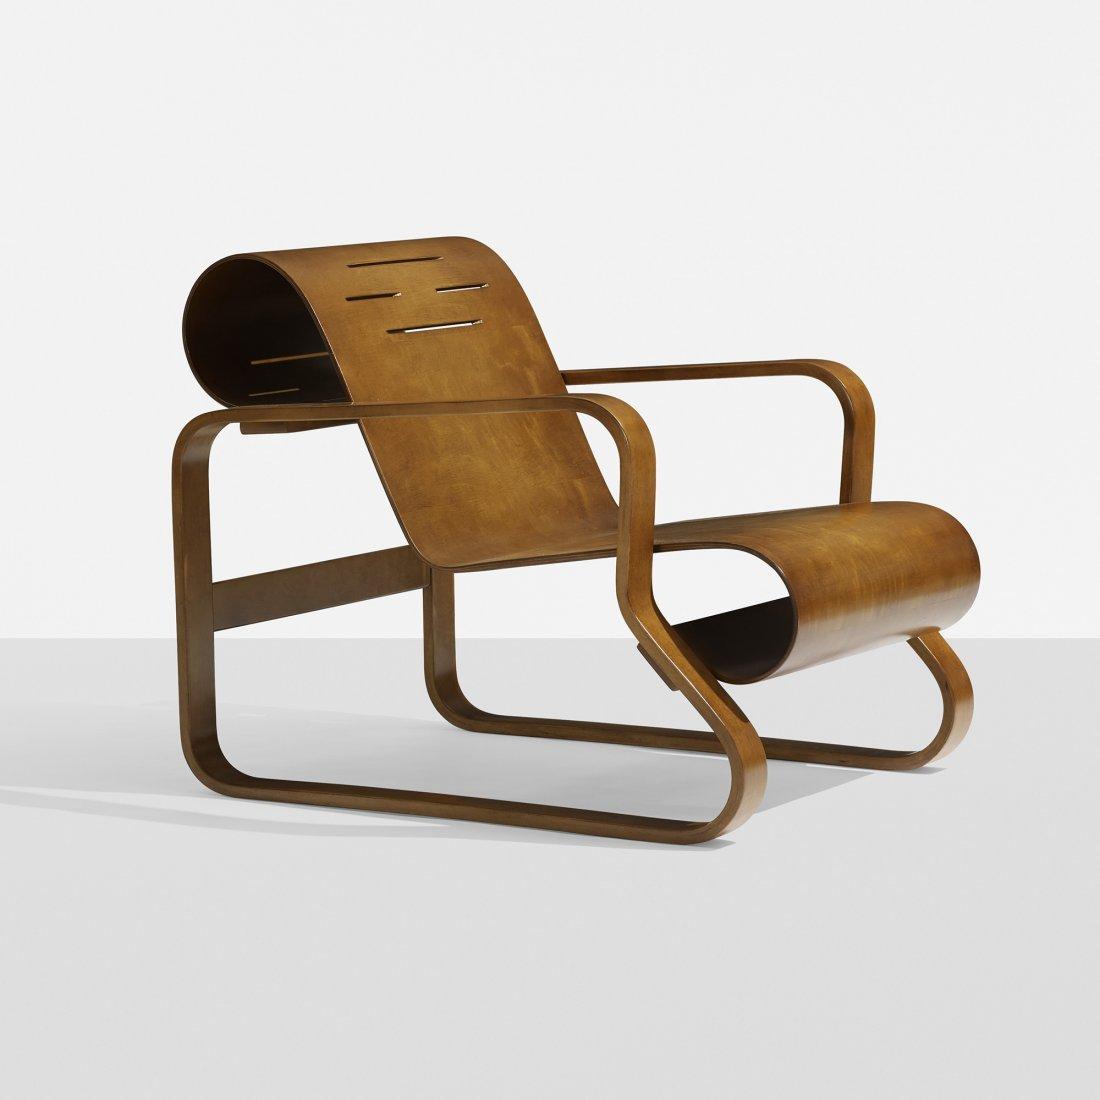 Alvar Aalto Paimio lounge chair